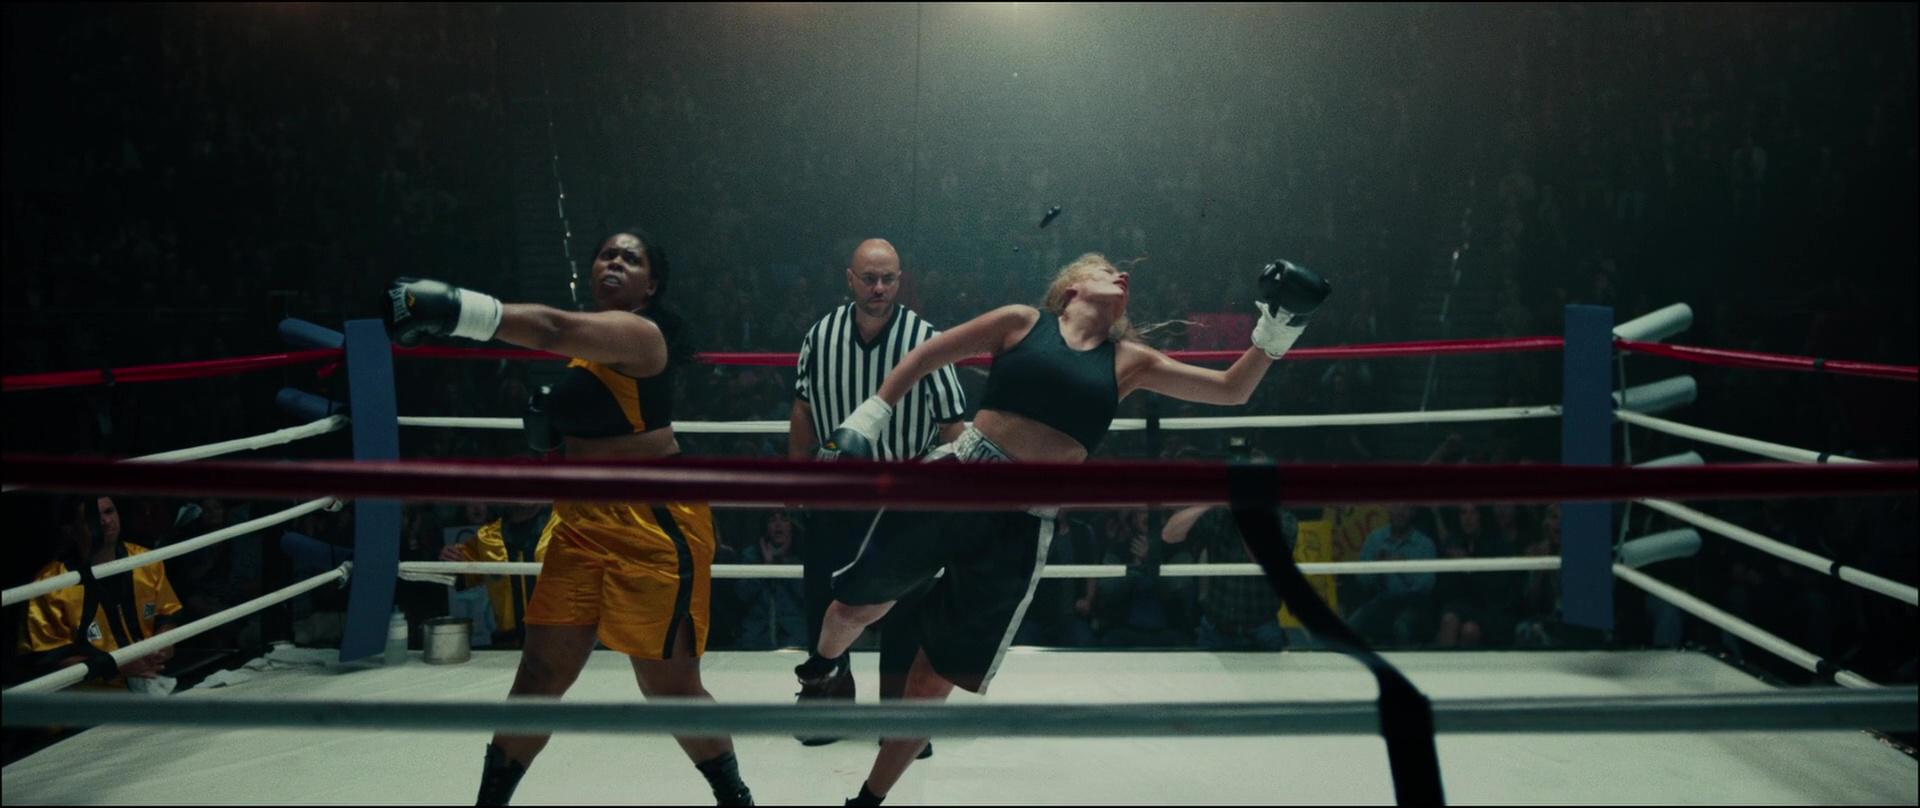 Everlast Boxing Gloves Worn By Margot Robbie In I Tonya 2017 Movie